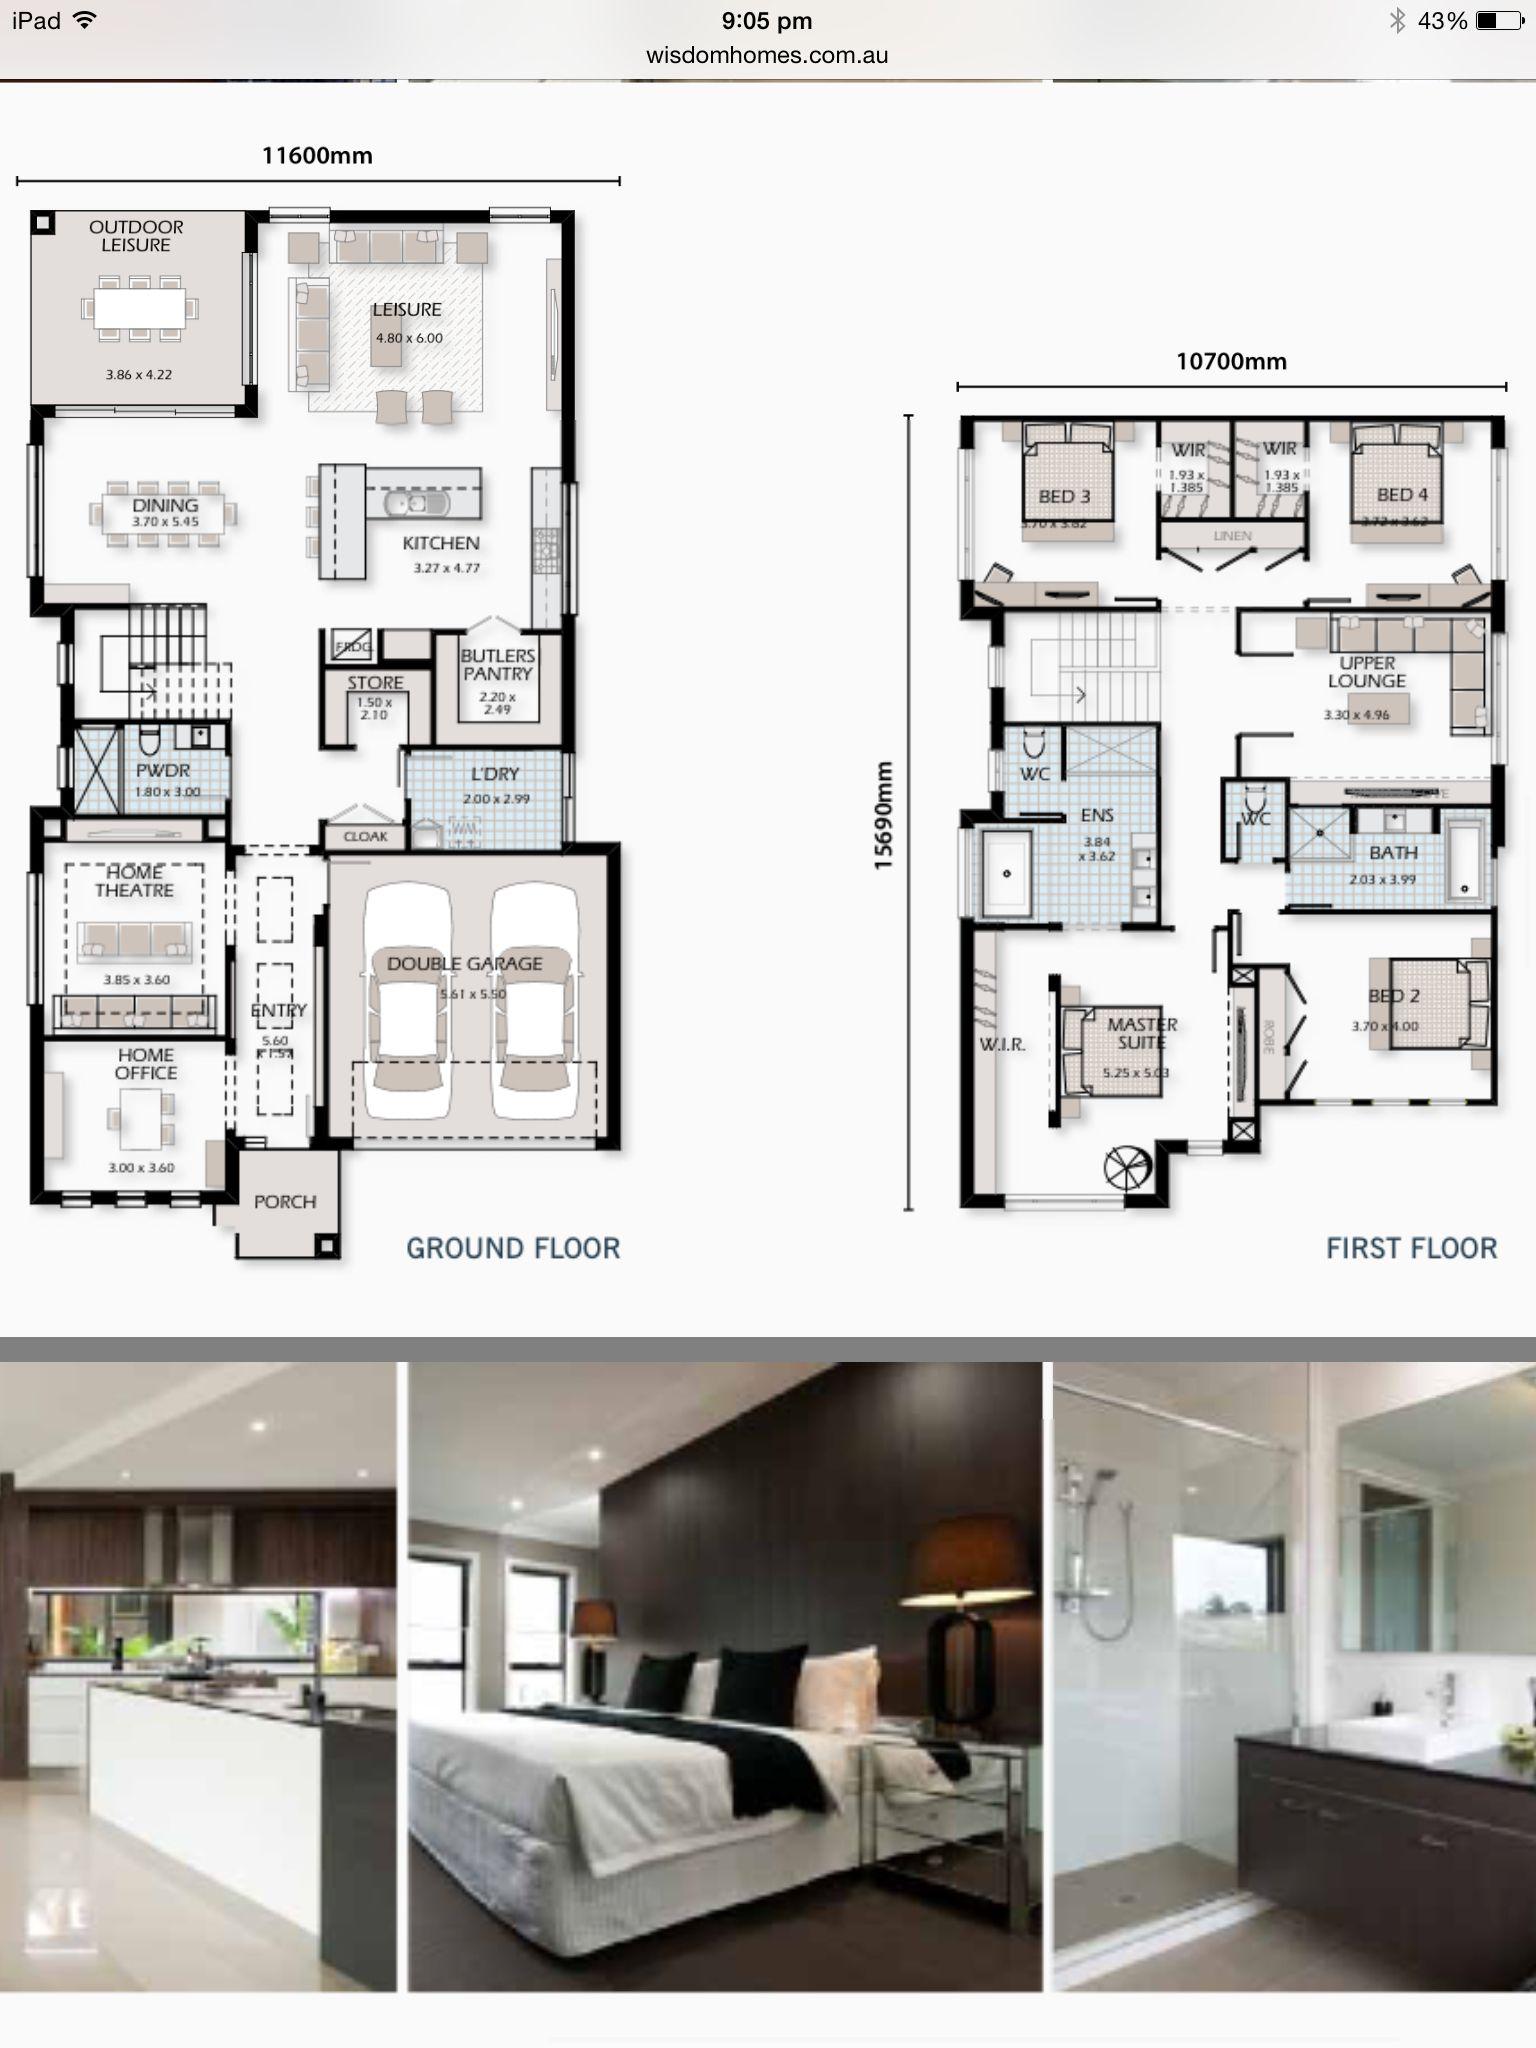 Wisdom homes majestic floor plans casa plantas pinterest